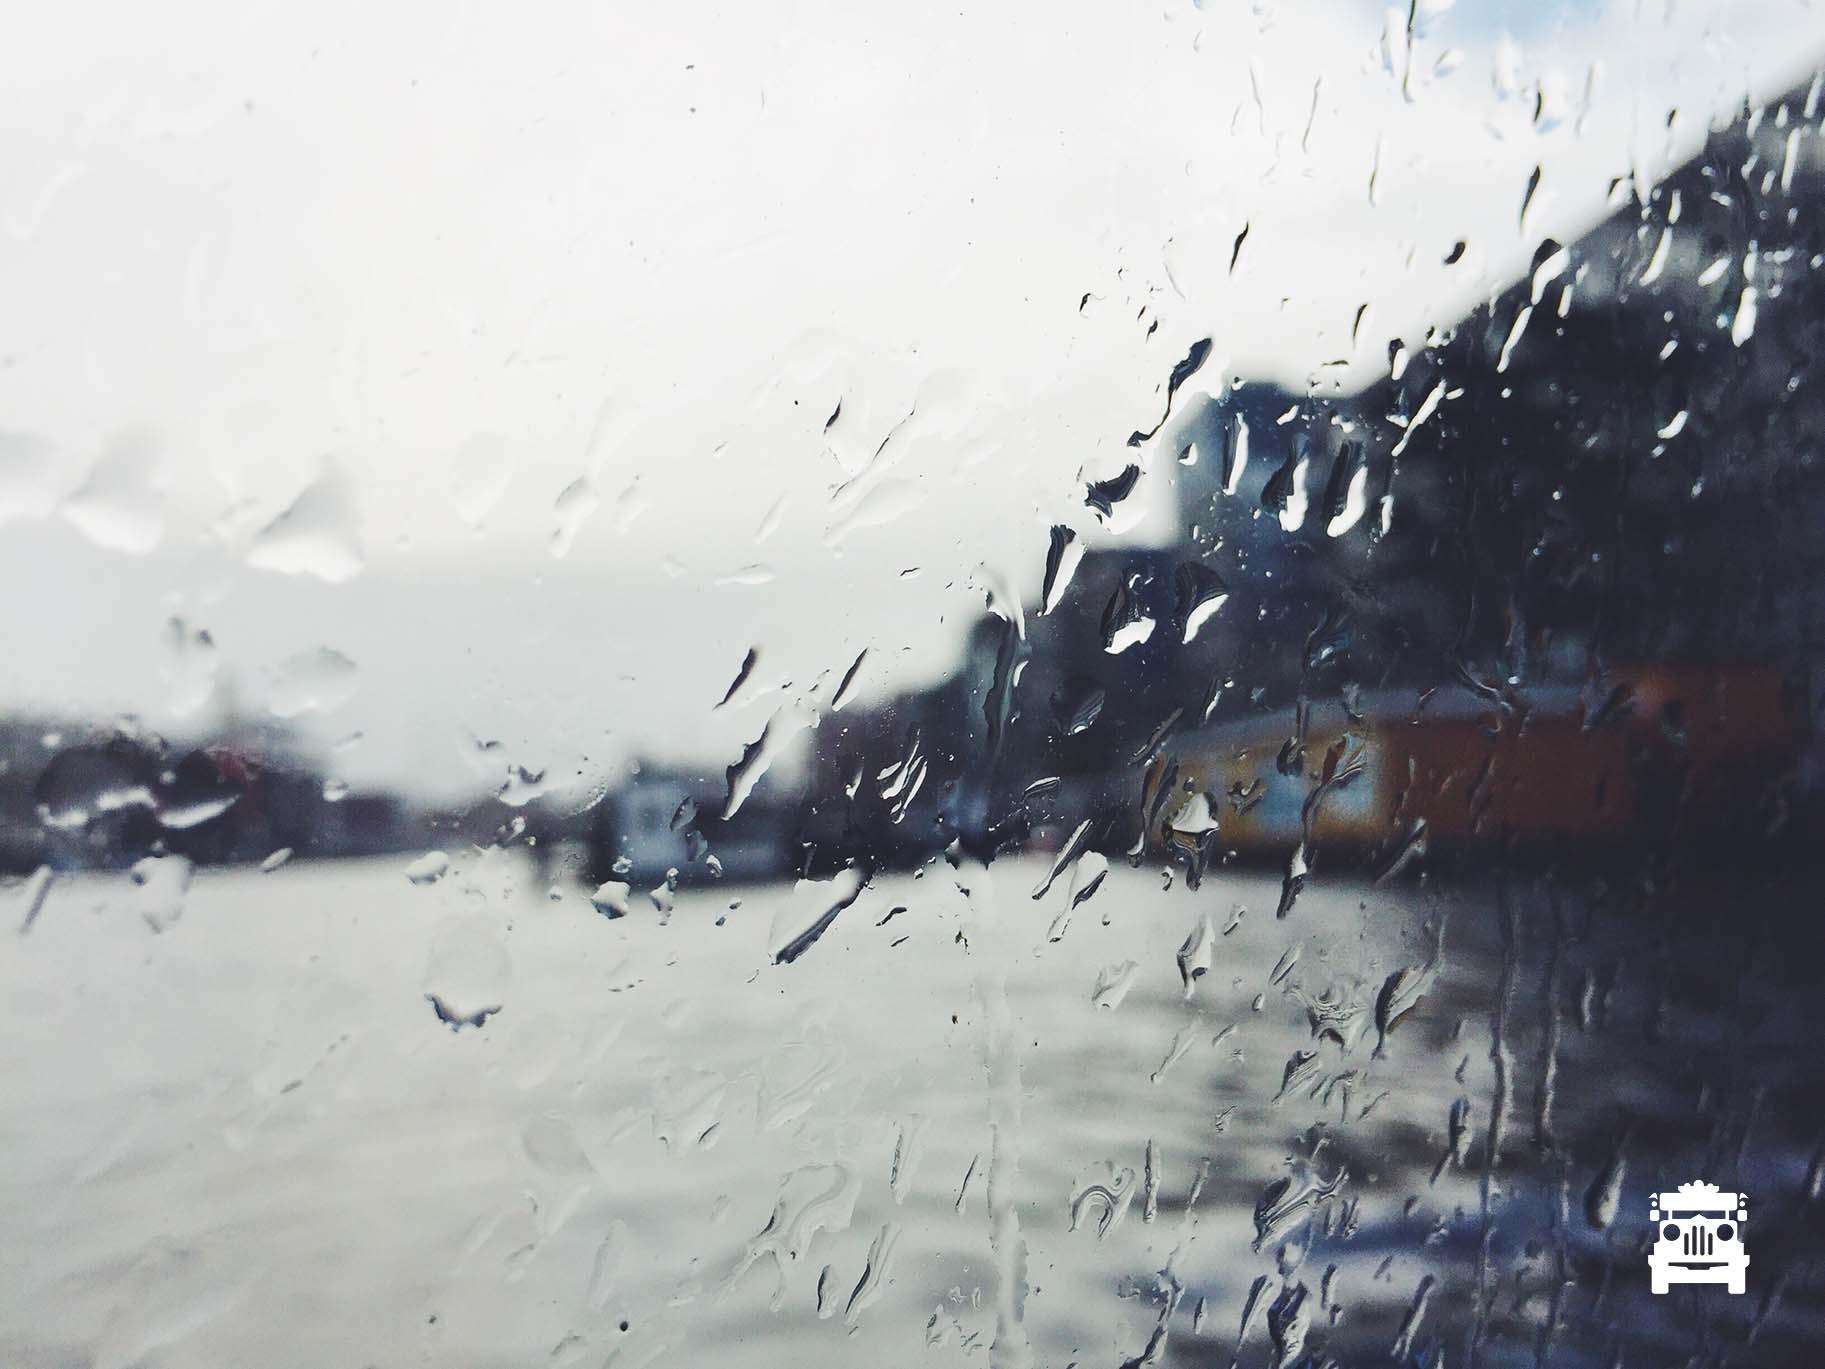 Then it rained.